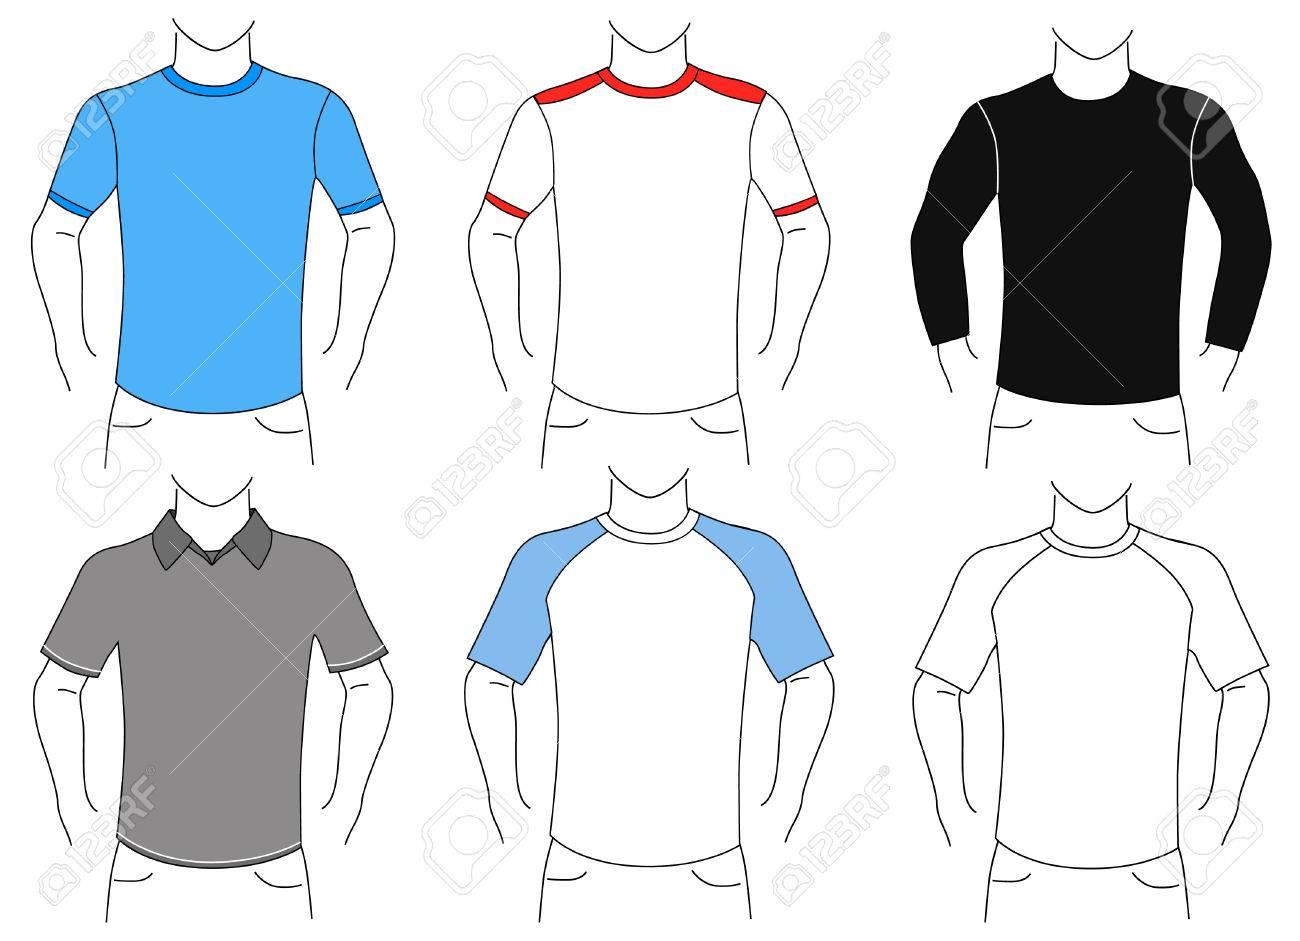 blank t shirt set (man) Stock Vector - 9060159